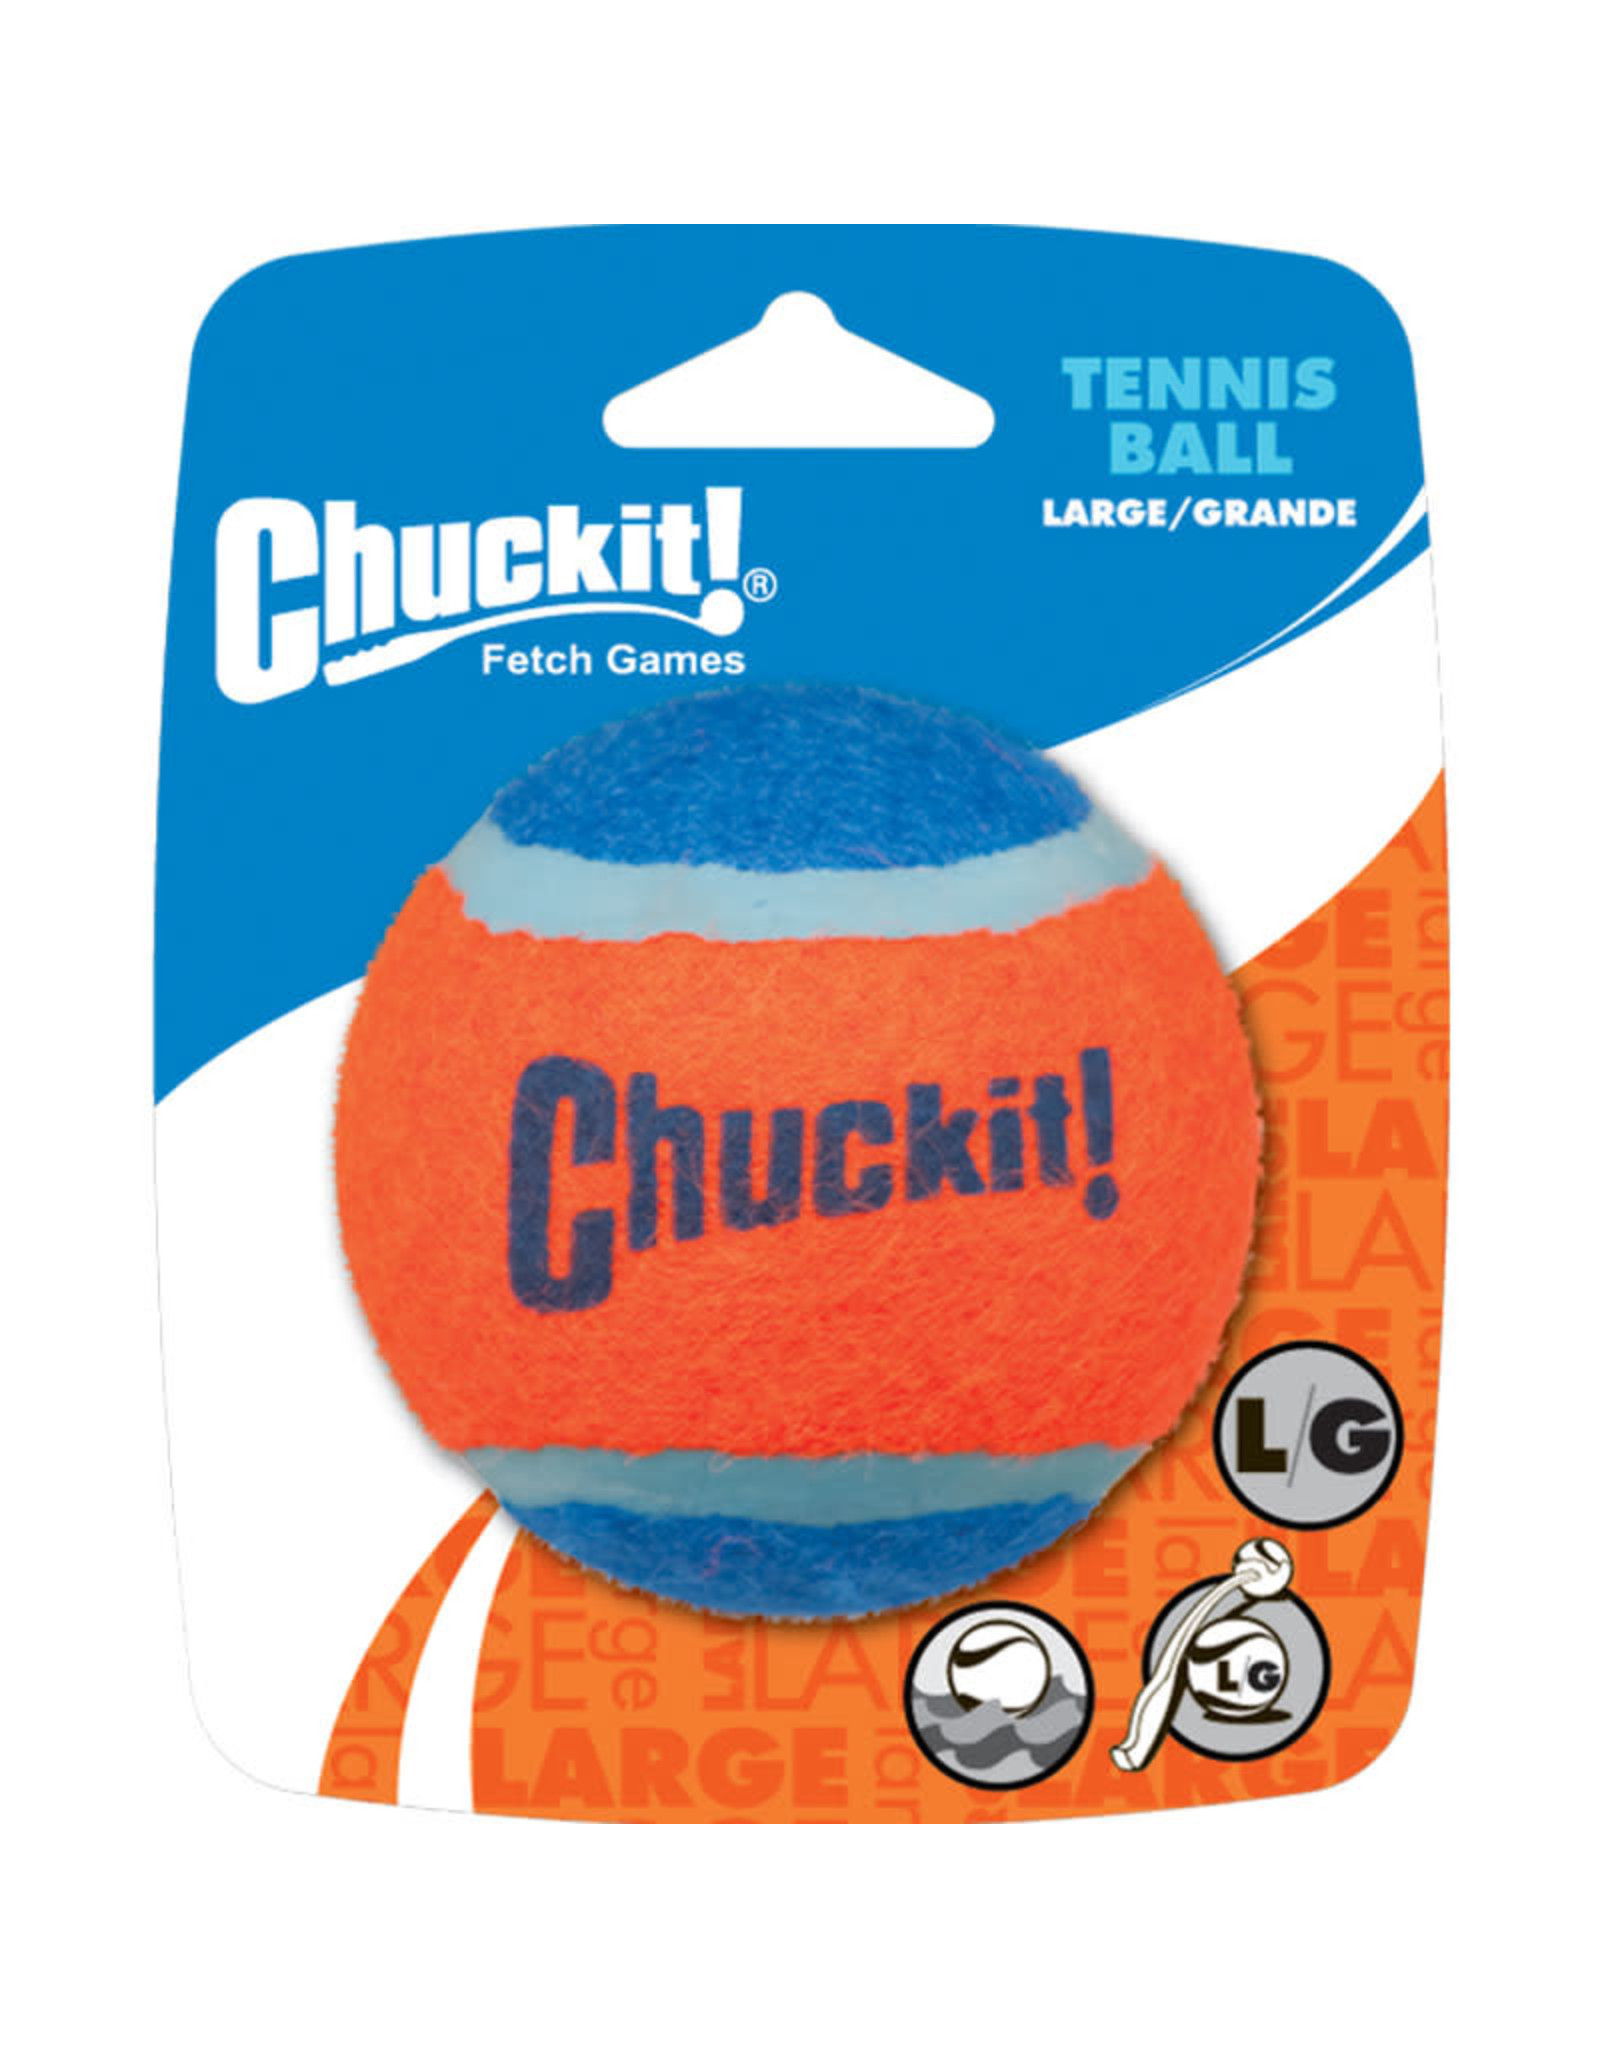 Chuckit! Chuckit!: Ball, L